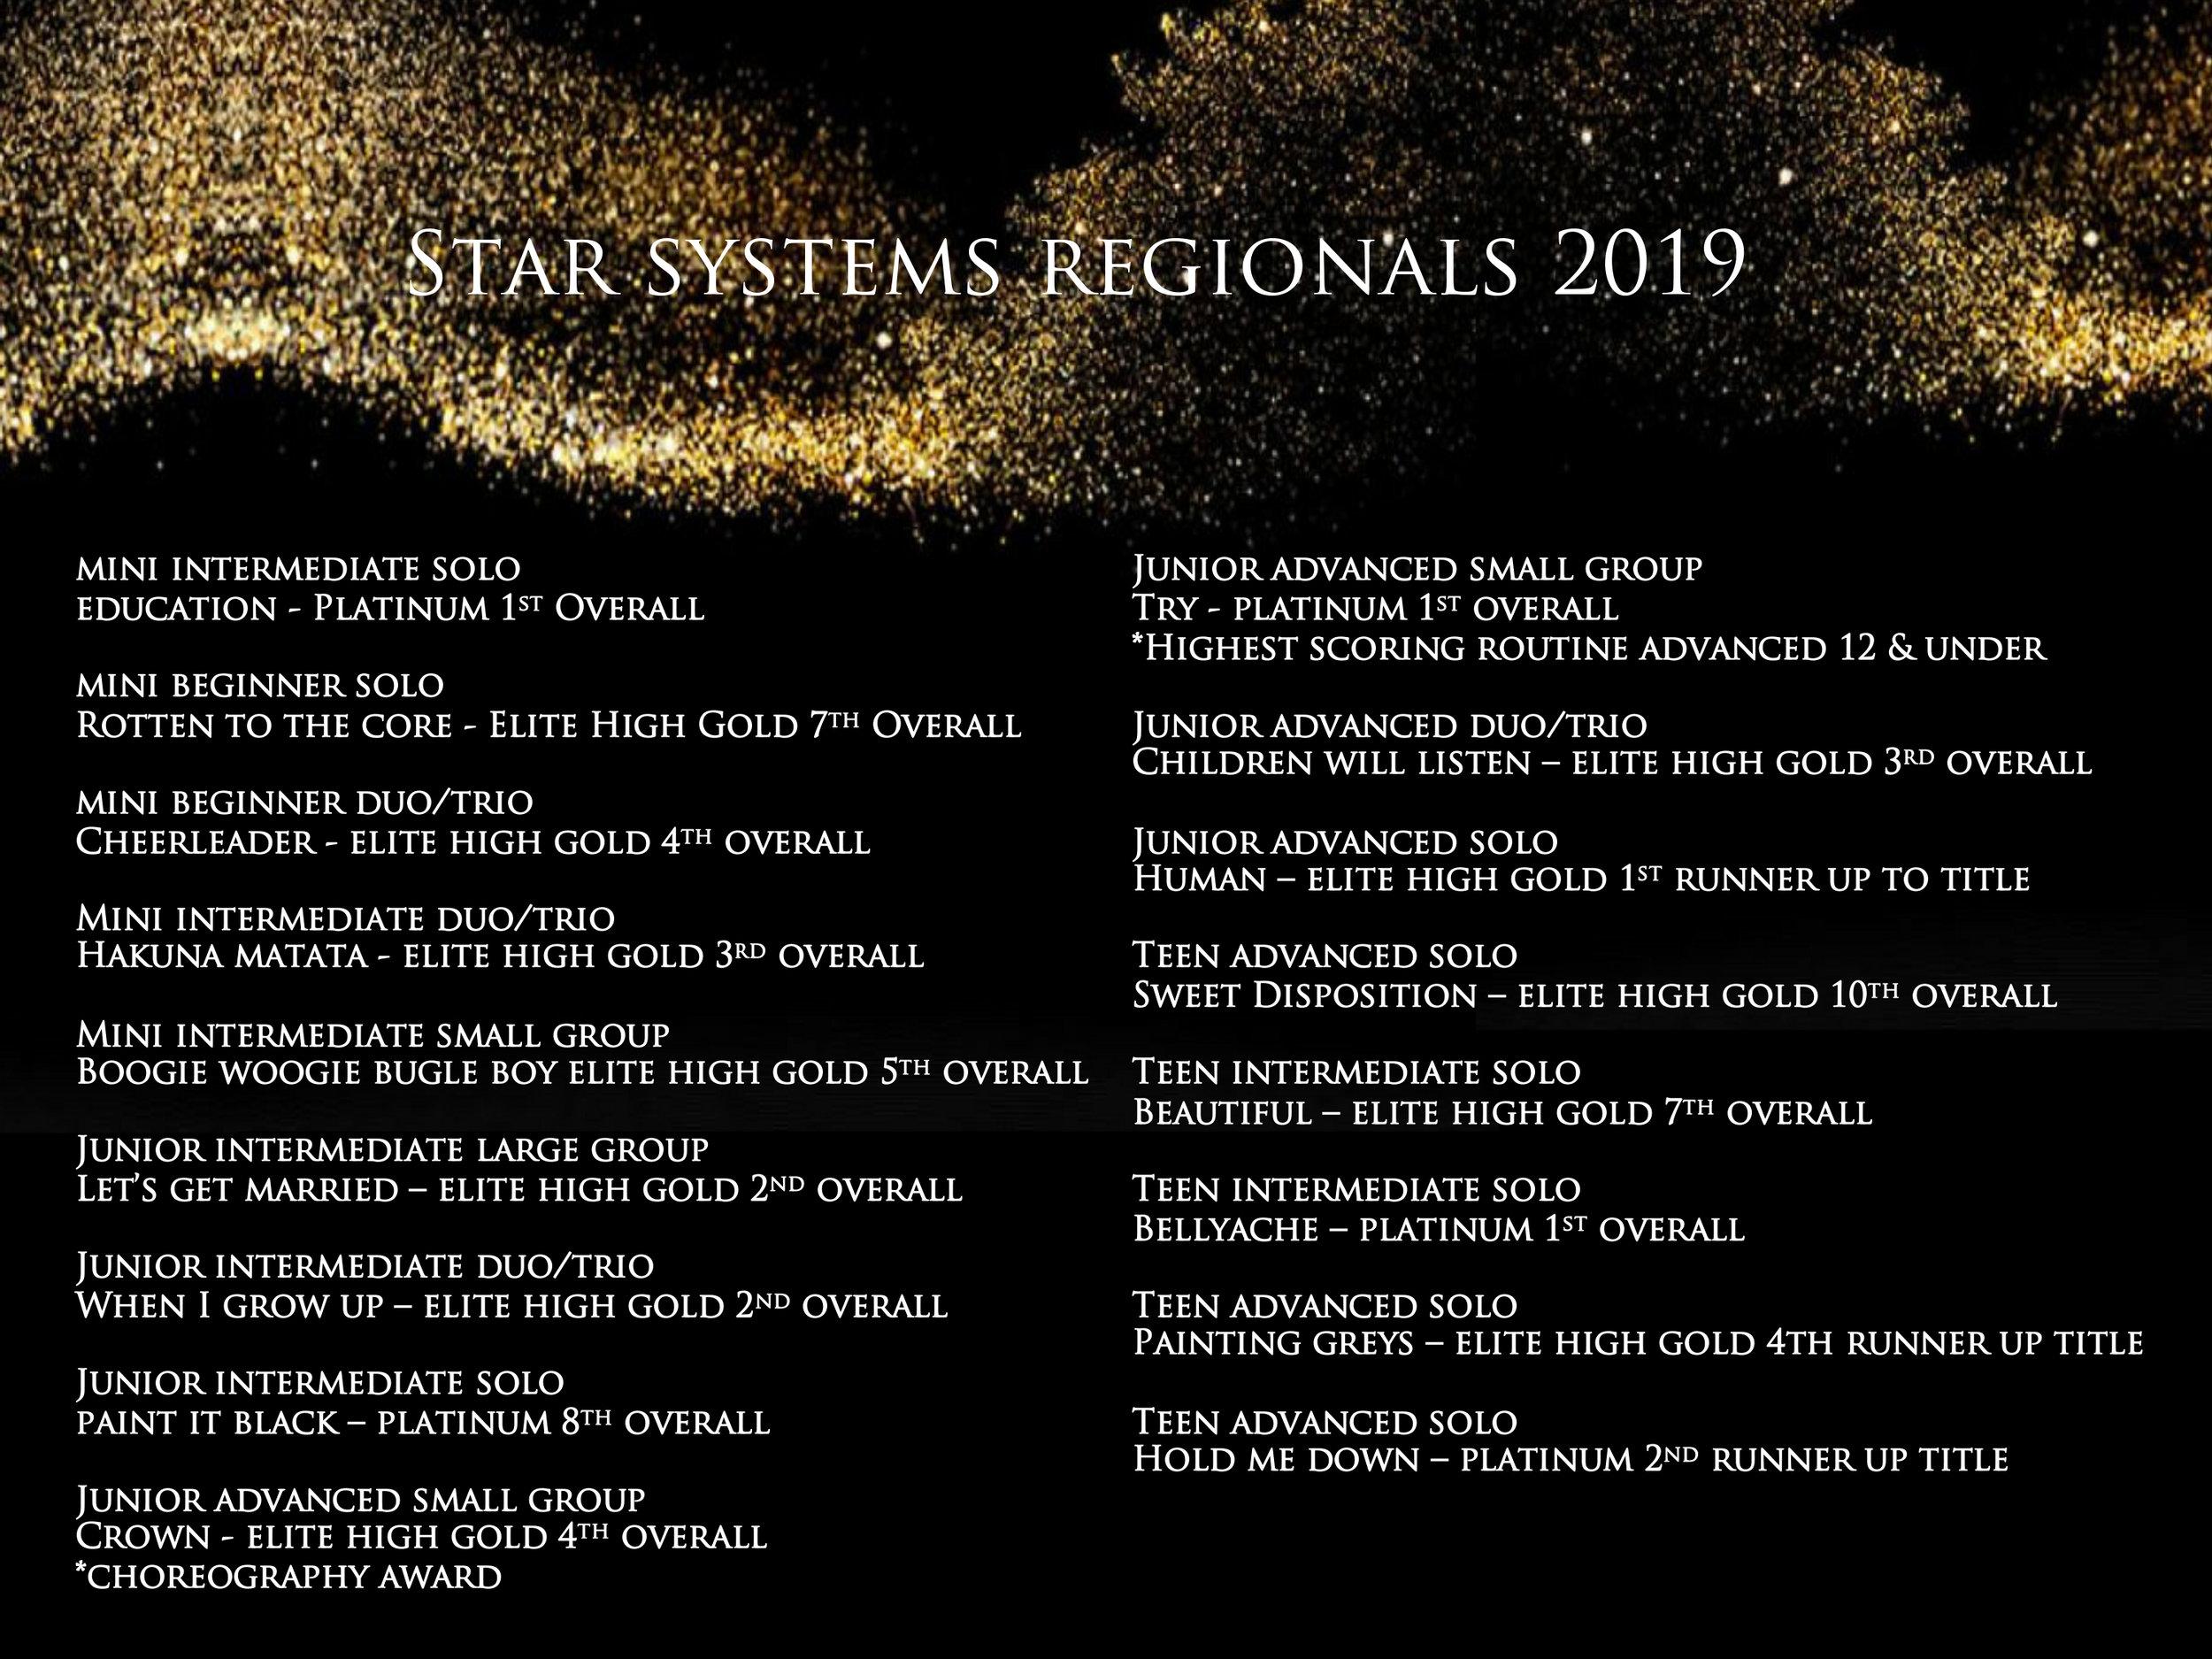 Star Systems.jpg